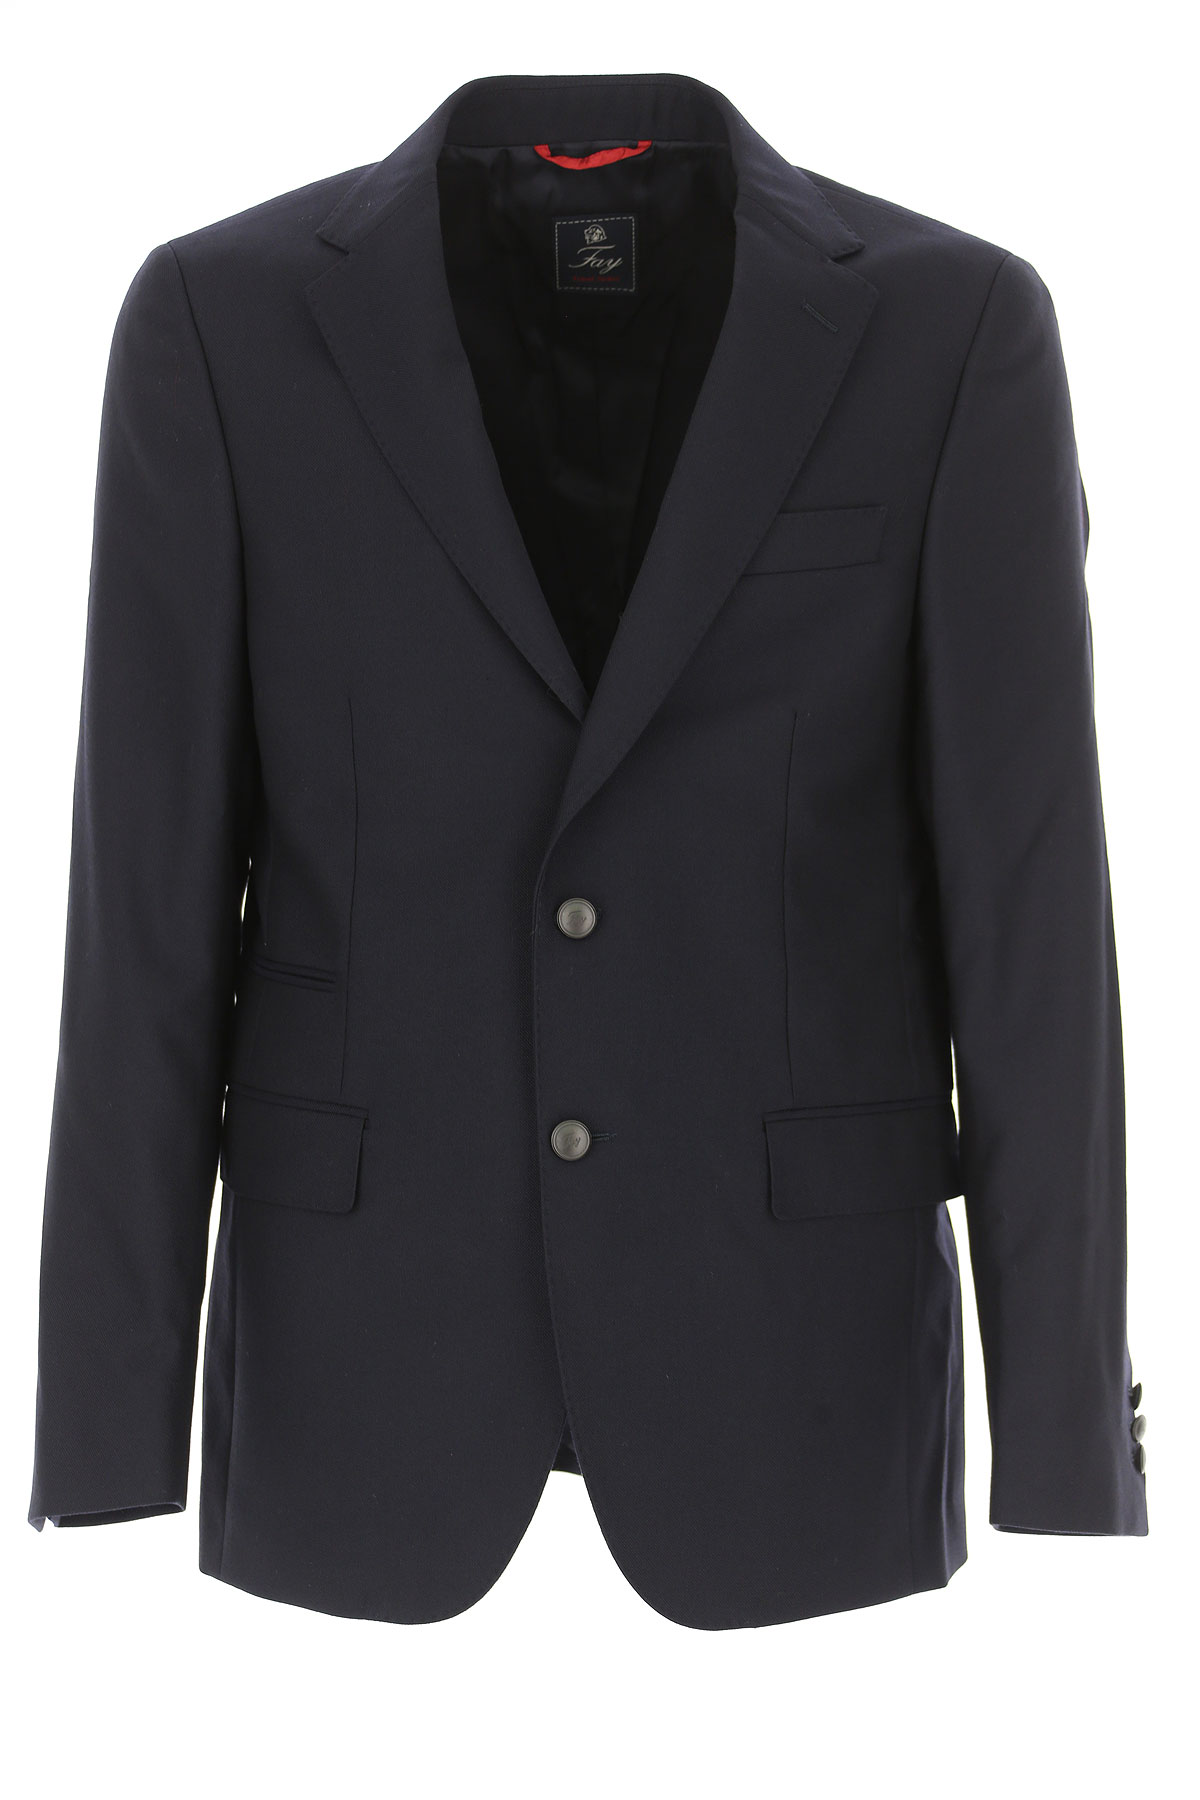 Image of Fay Blazer for Men, Sport Coat, Navy Blue, polyestere, 2017, L M